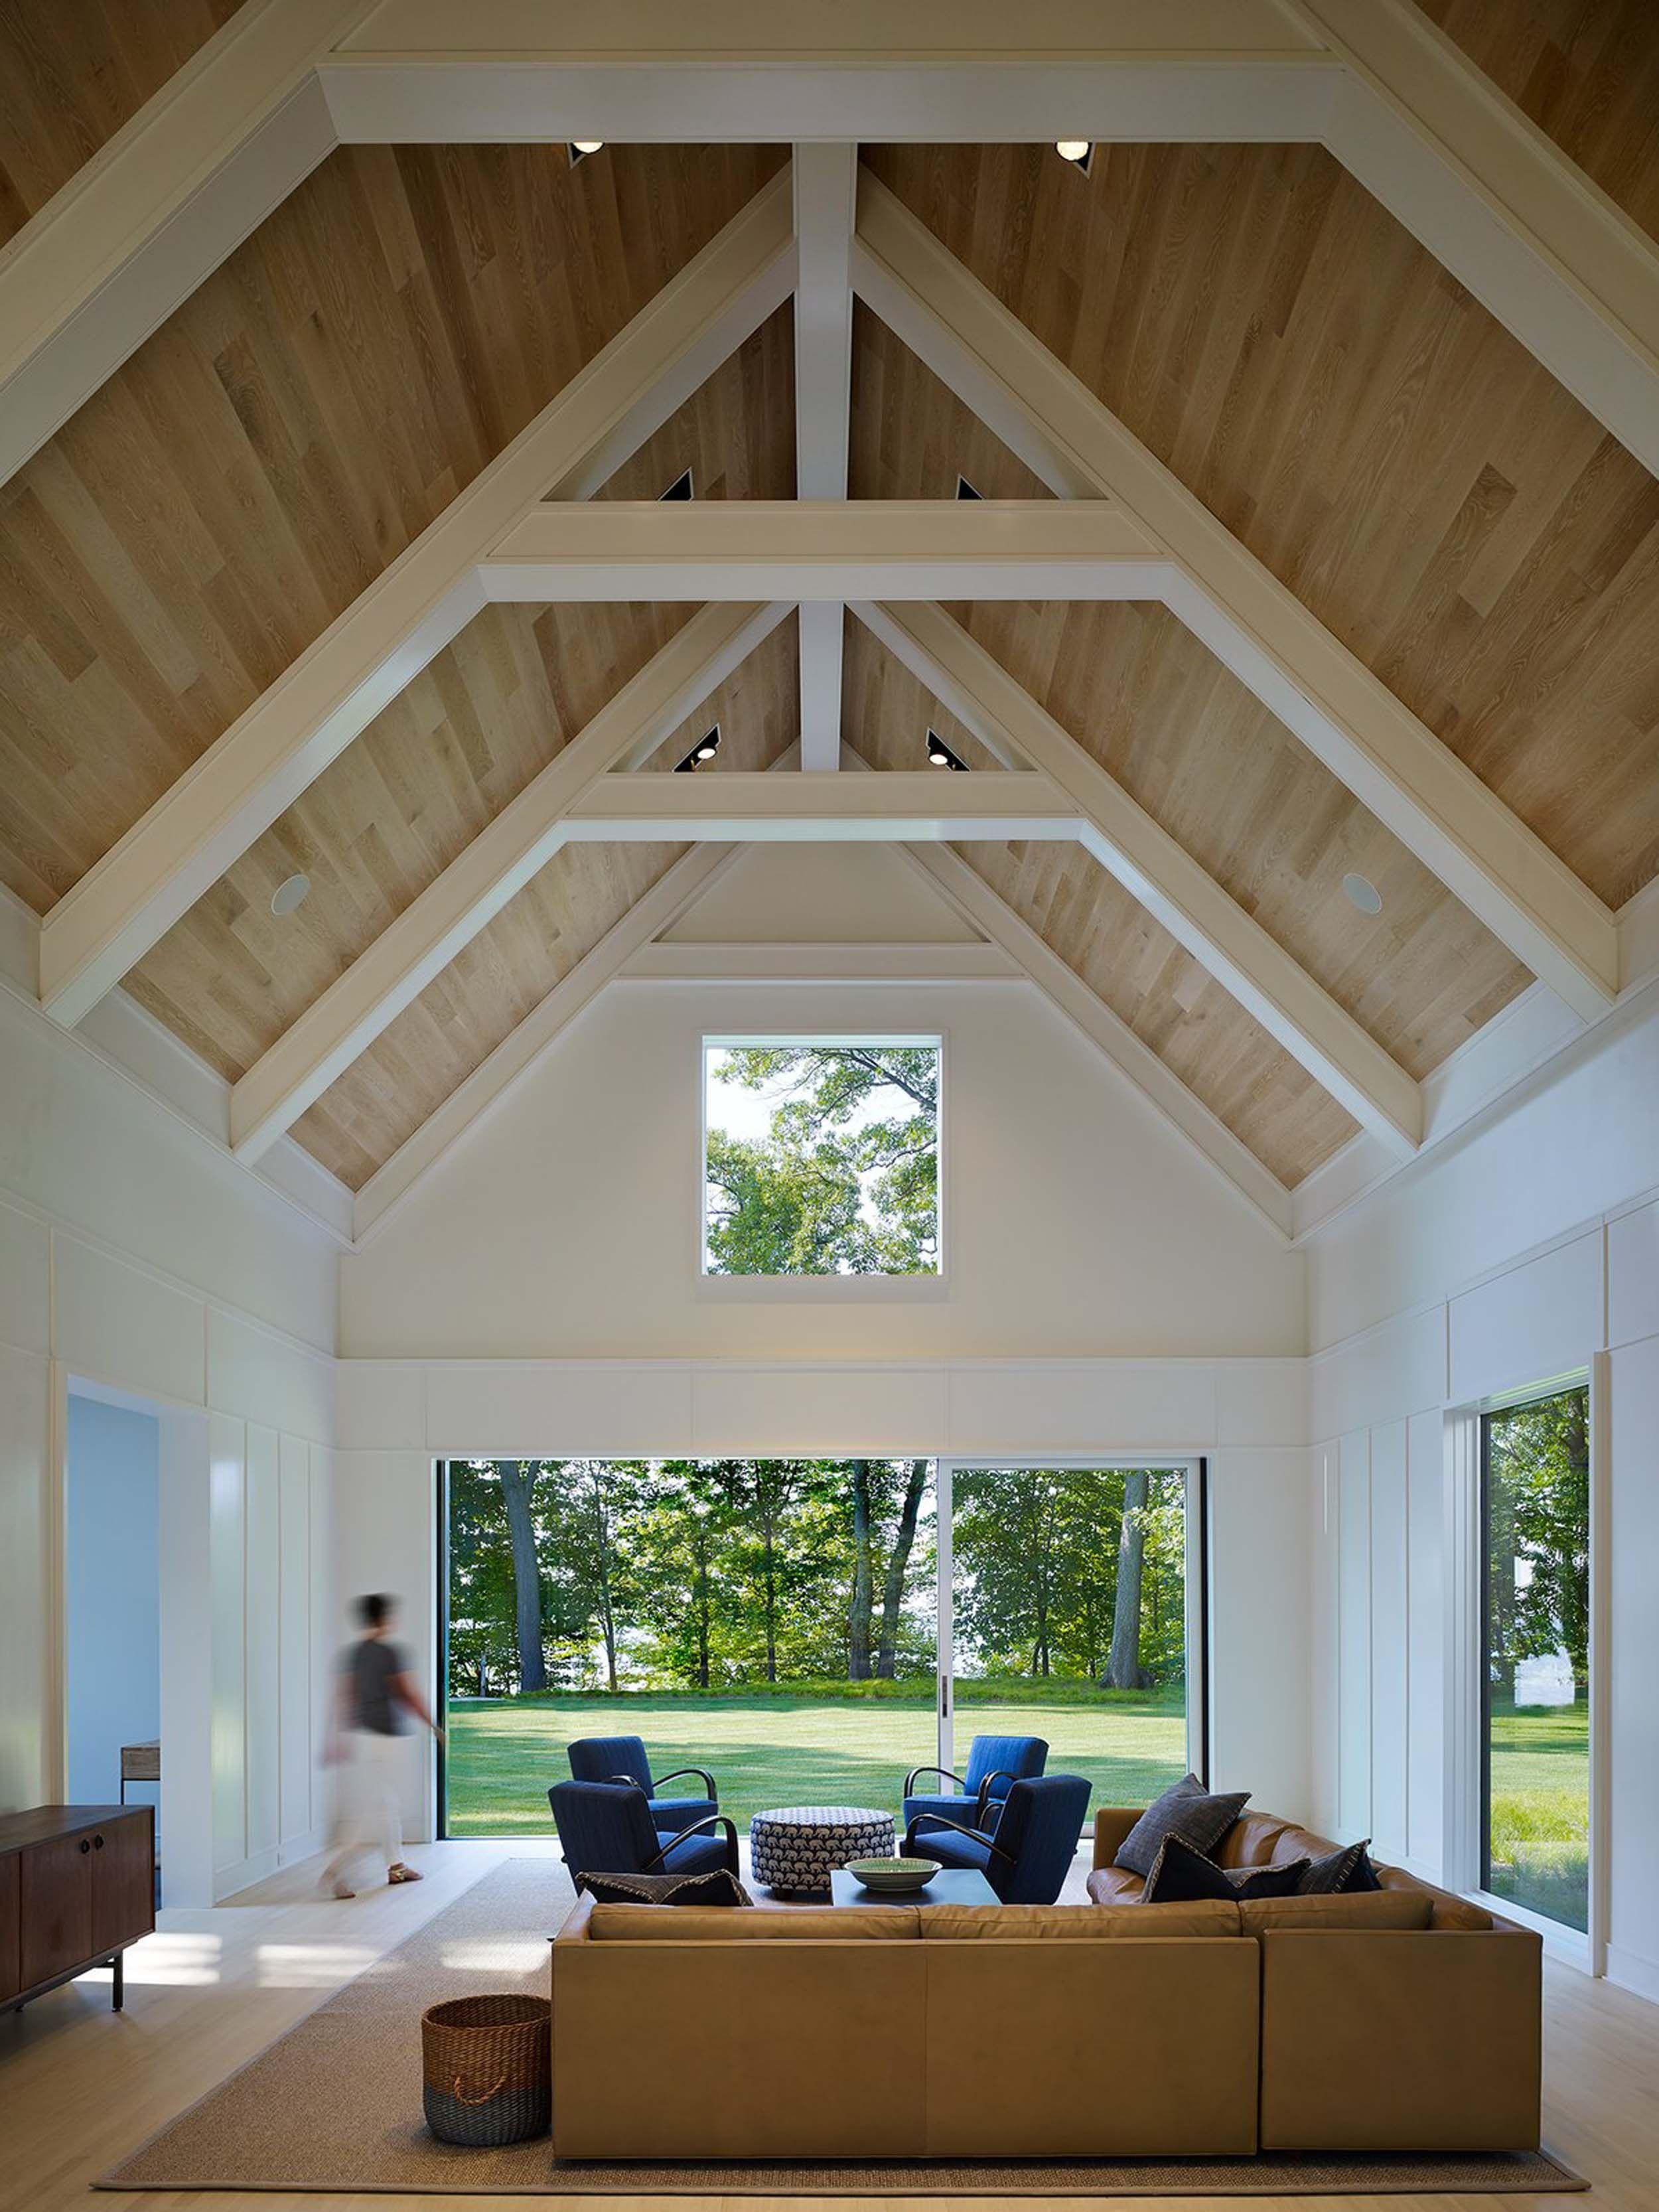 Mountain House Refinishing Ceilings: Is Good Enough Good Enough? - Emily Henderson